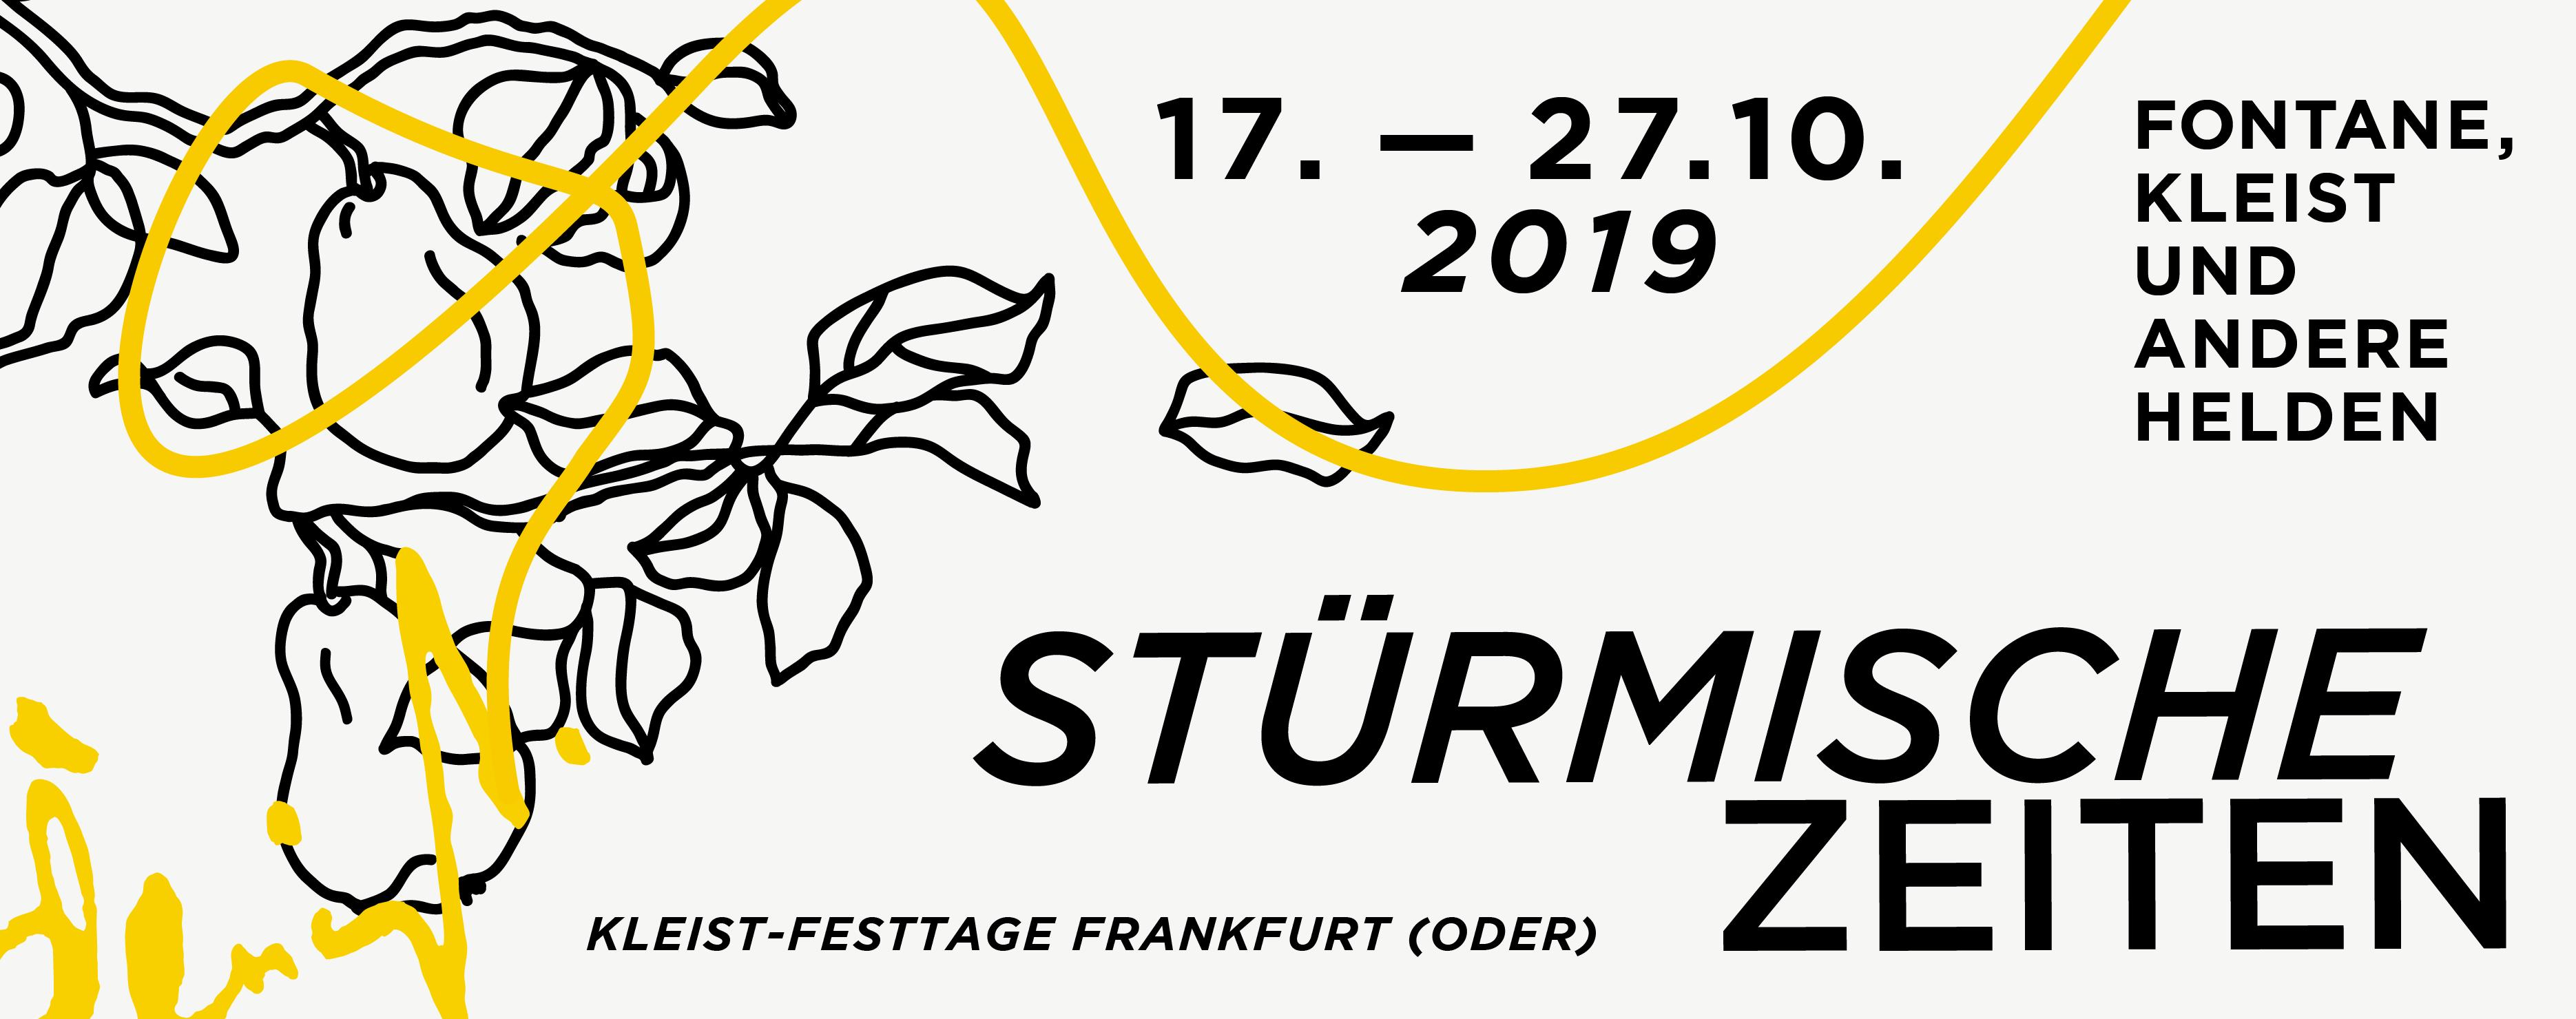 Kleist-Festtage 2019